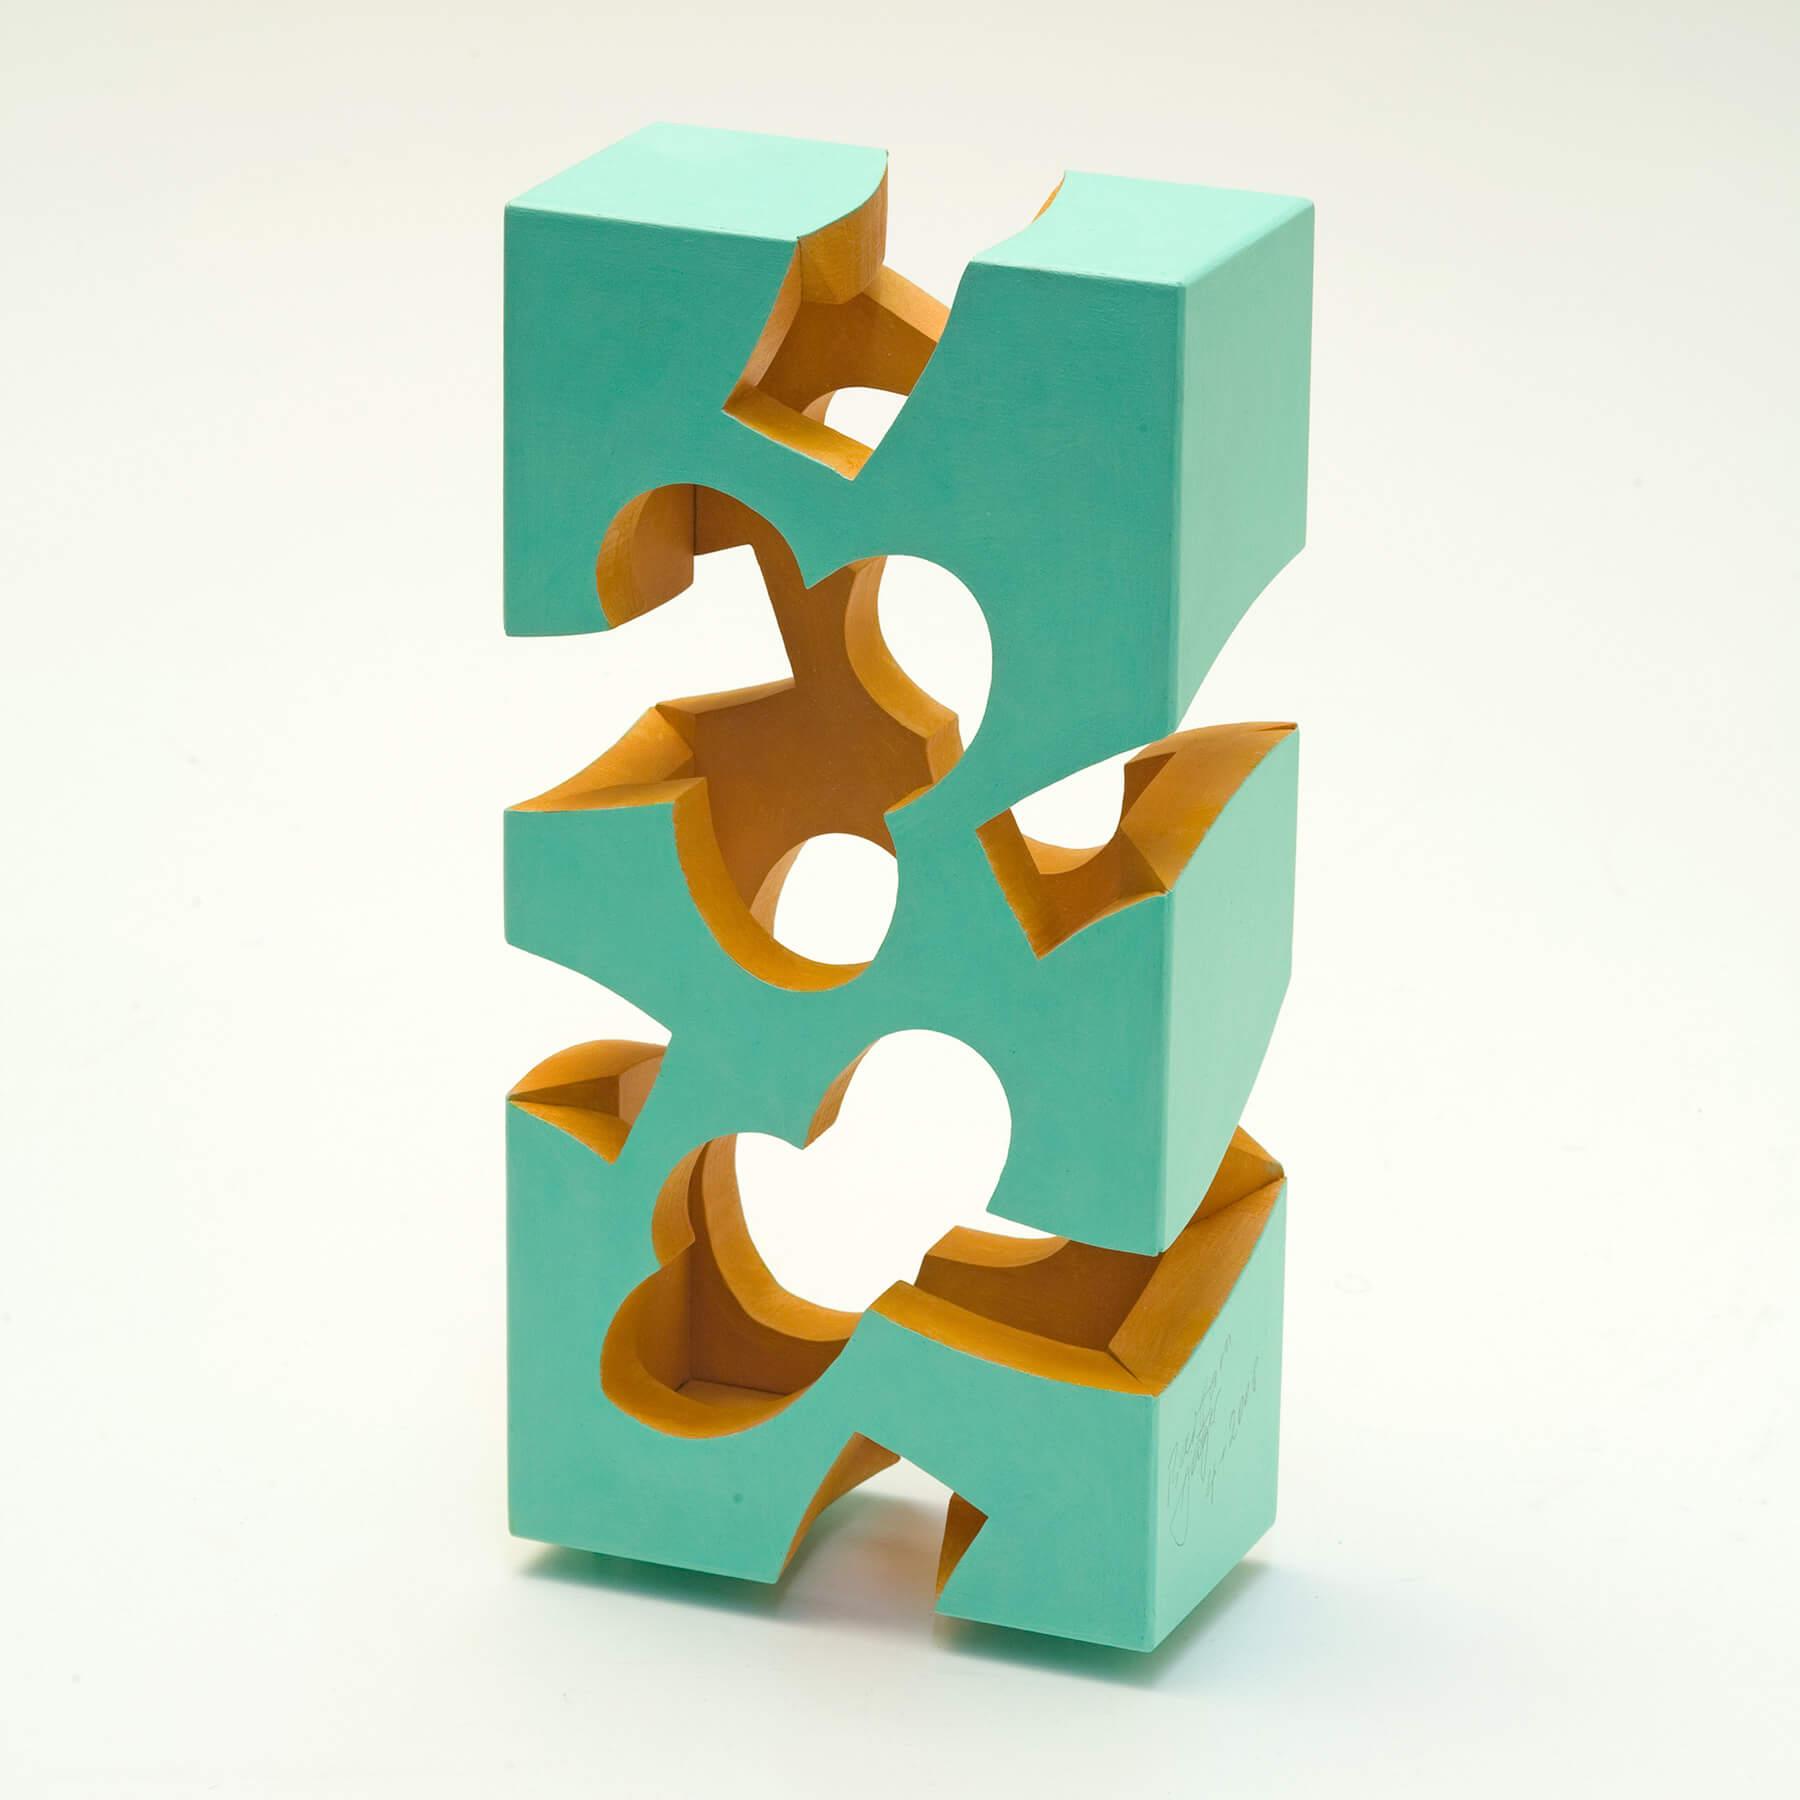 Barbara Jäger Skulpturen Stehende Wand Holz Acryl